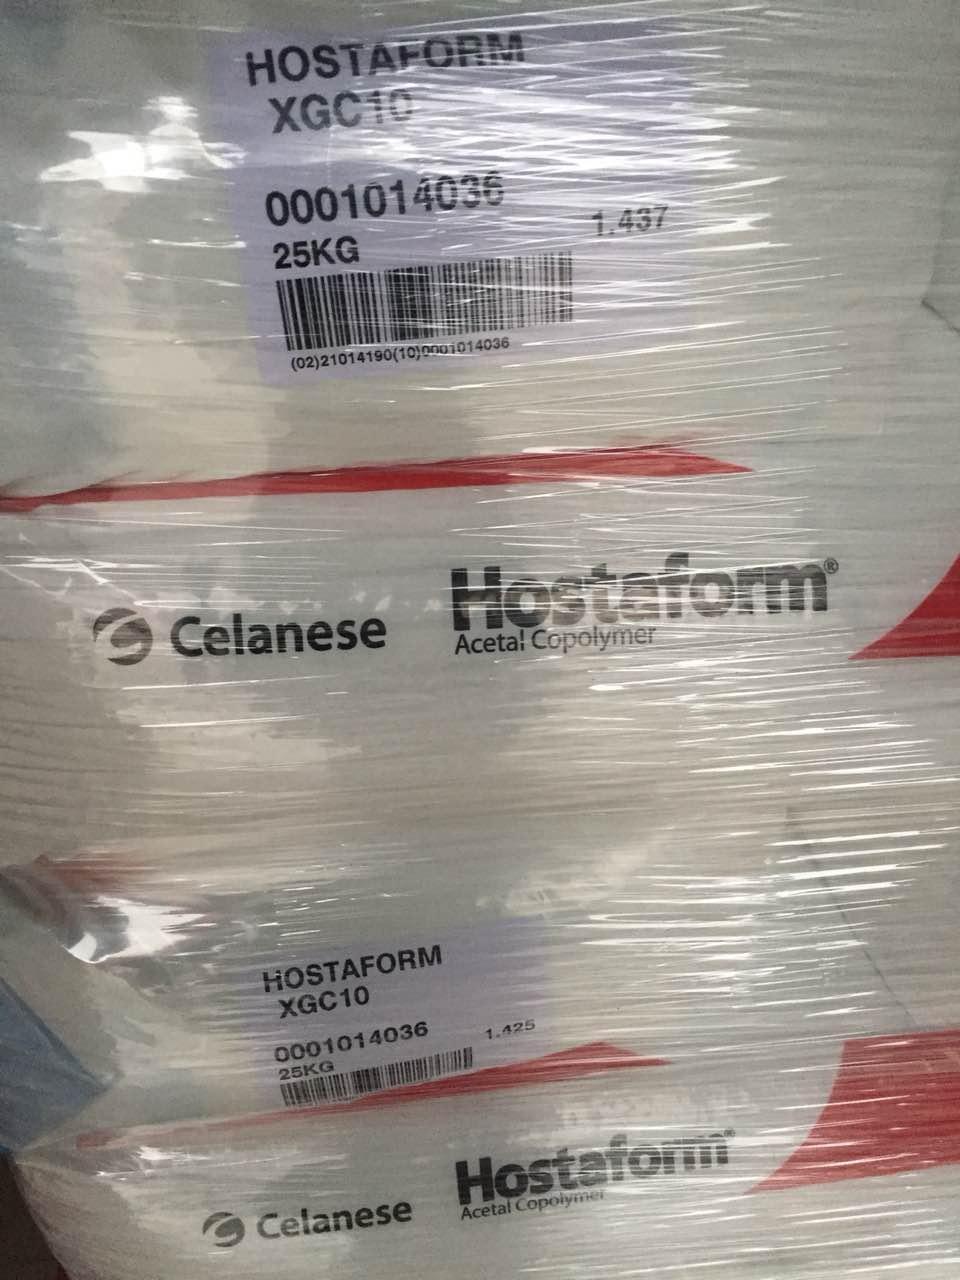 Hostaform XGC10